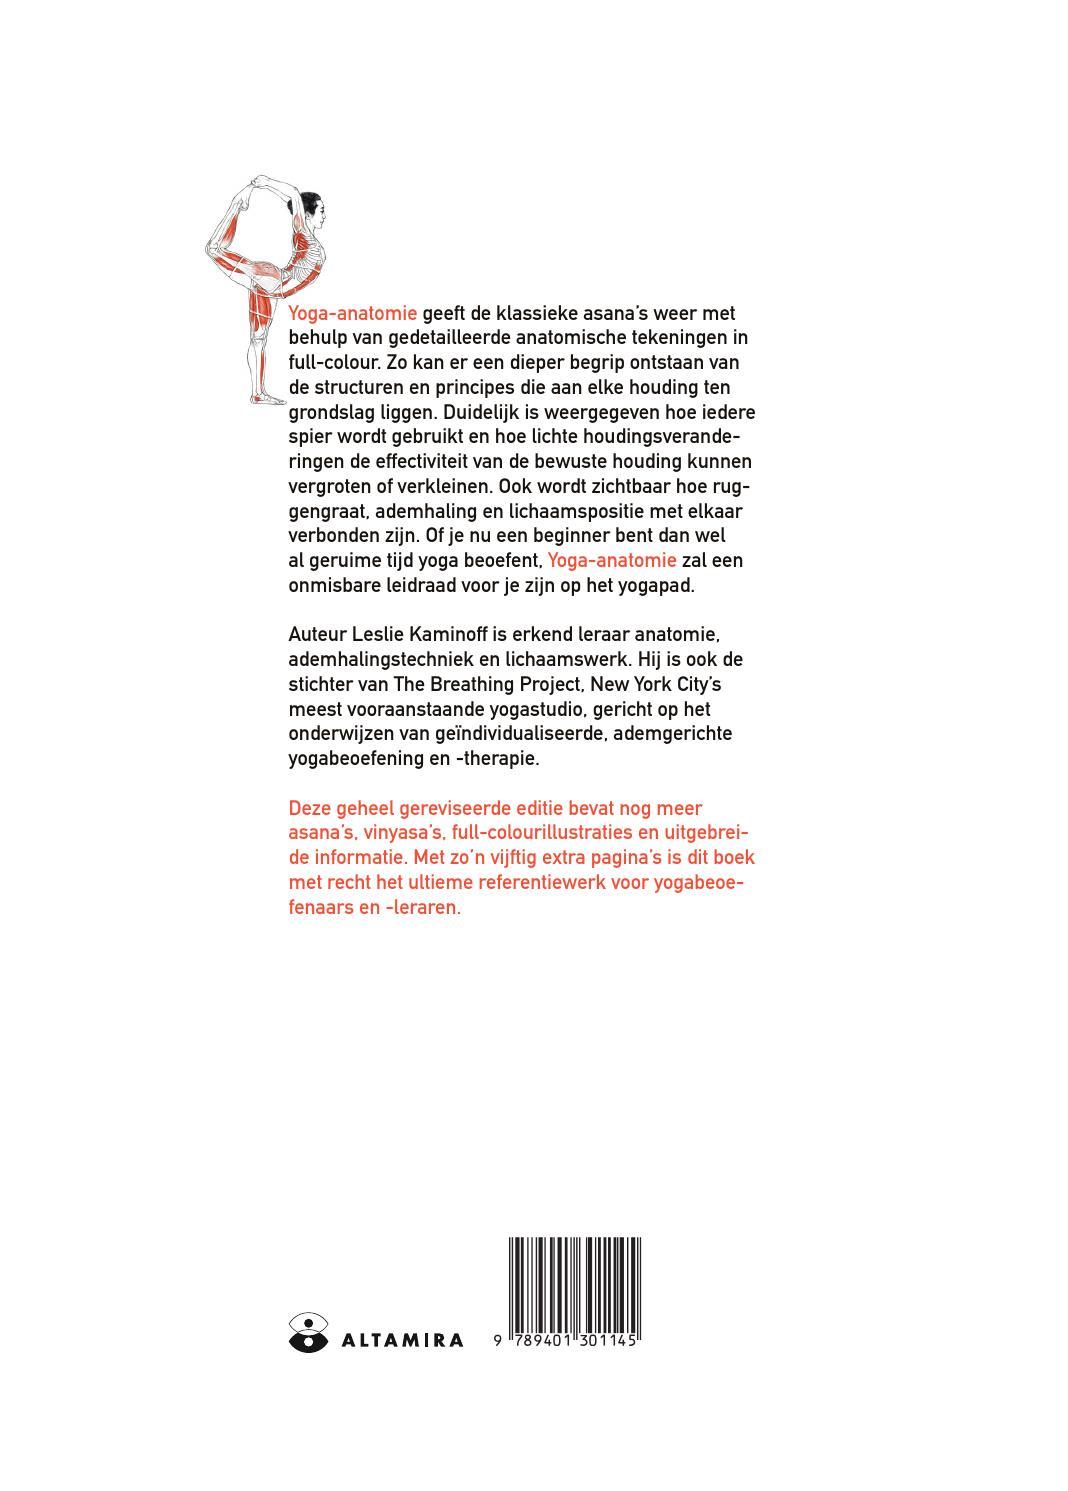 Yoga anatomie by Gottmer Uitgevers Groep - issuu